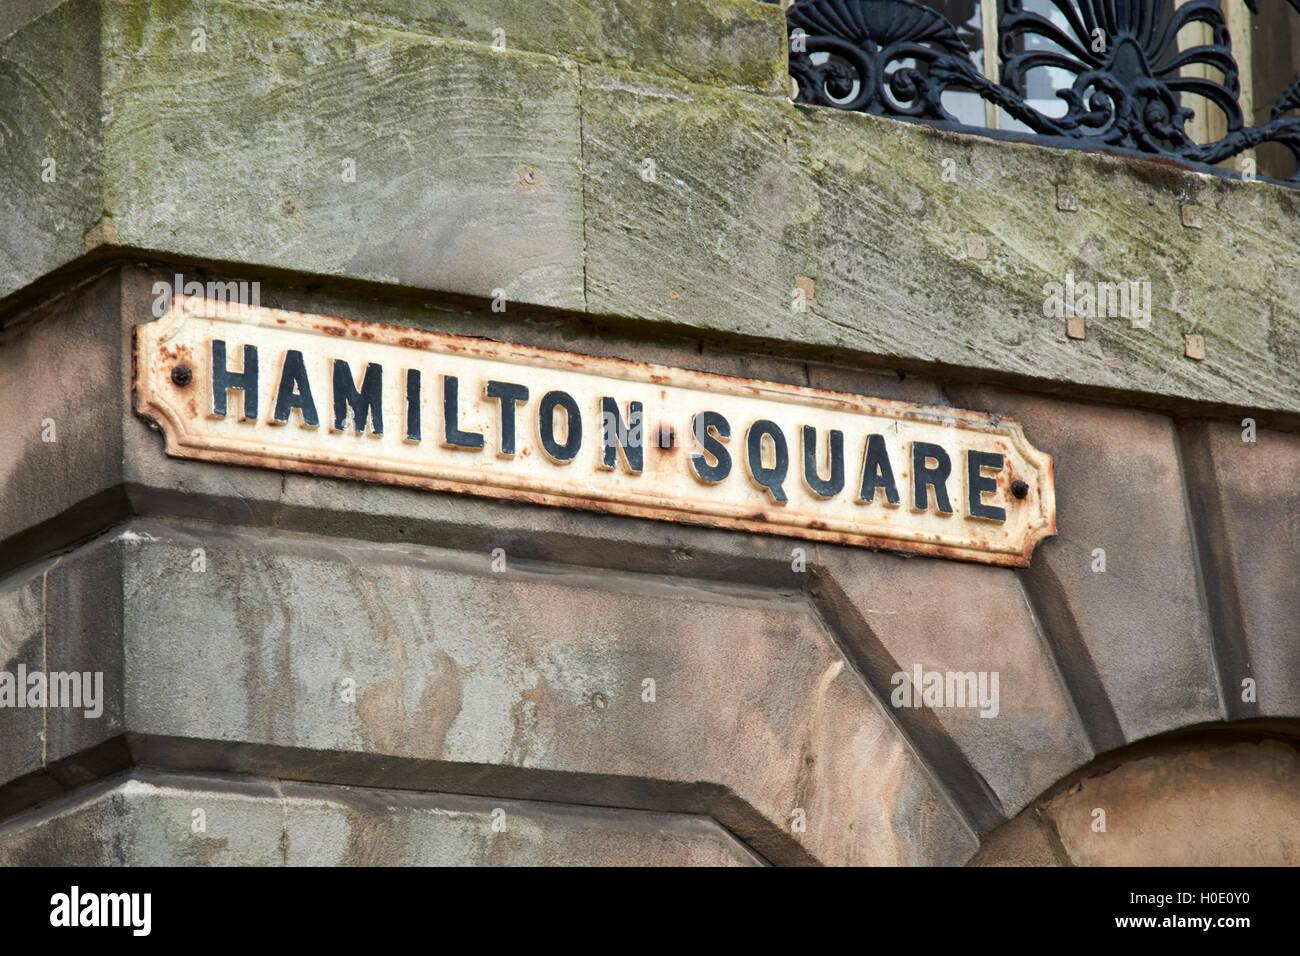 hamilton square birkenhead Merseyside UK - Stock Image